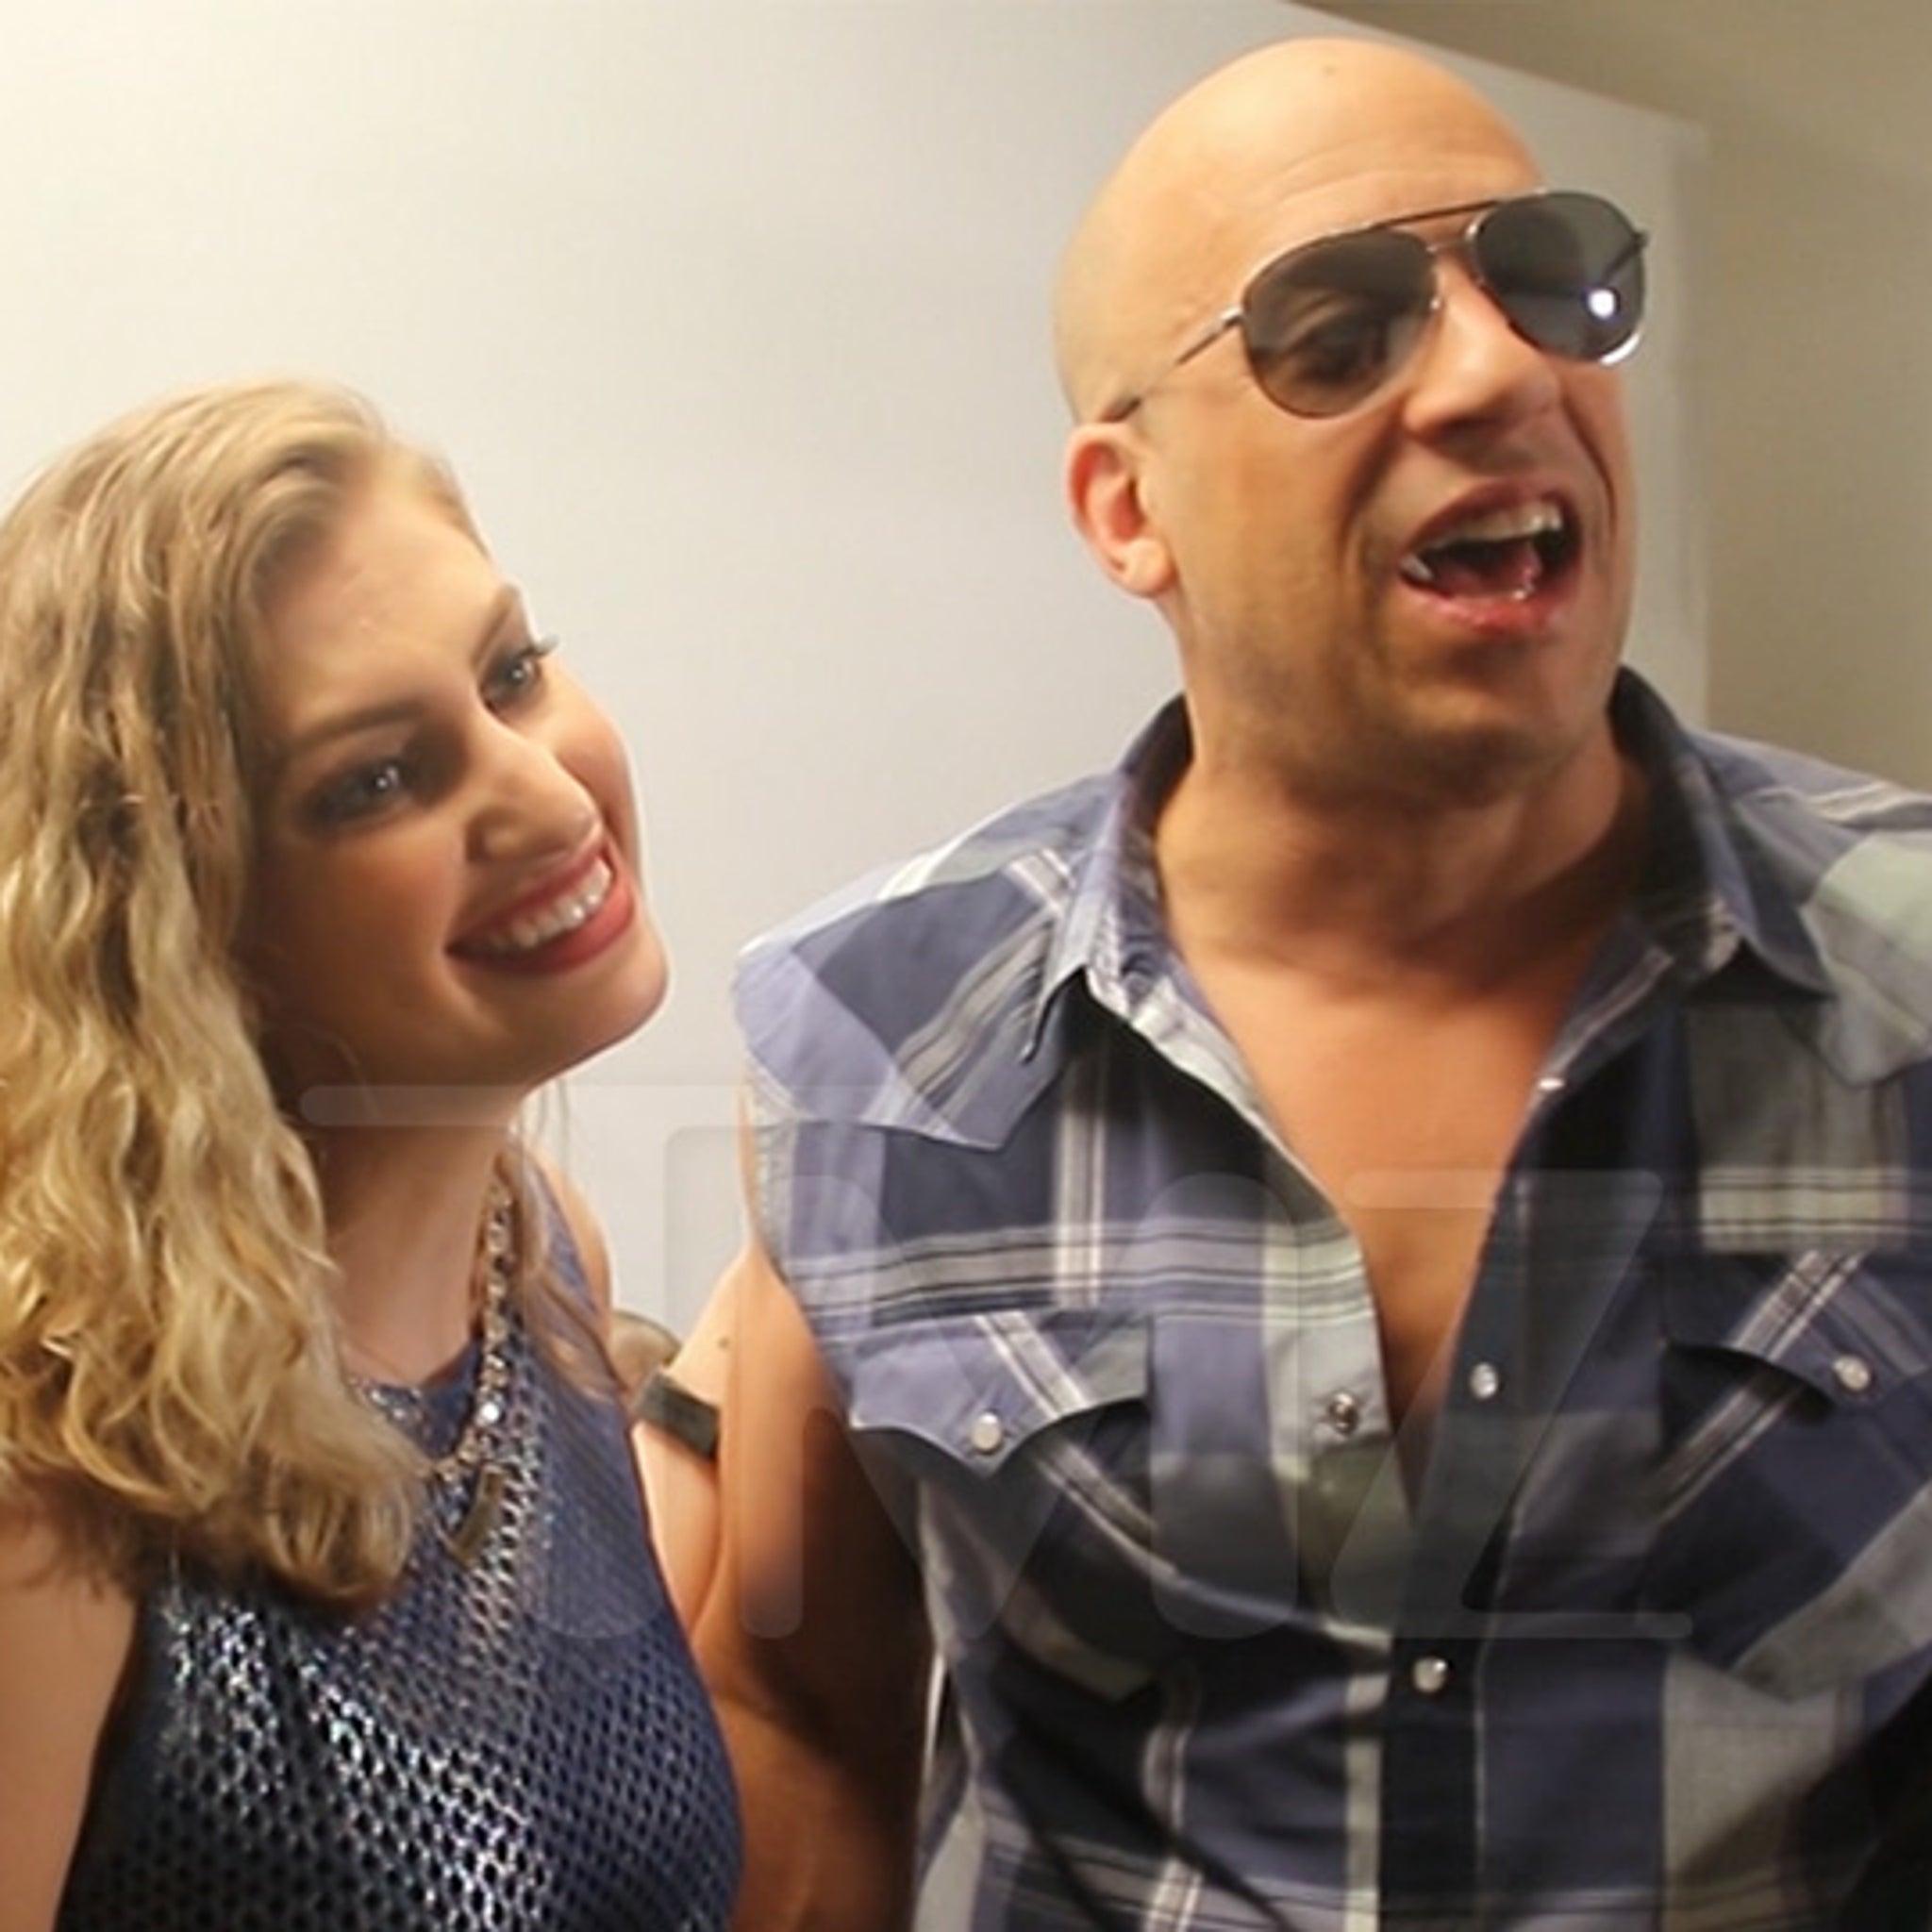 Vin Diesel's Brazilian Reporter Was Into Him After Bizarre Interview